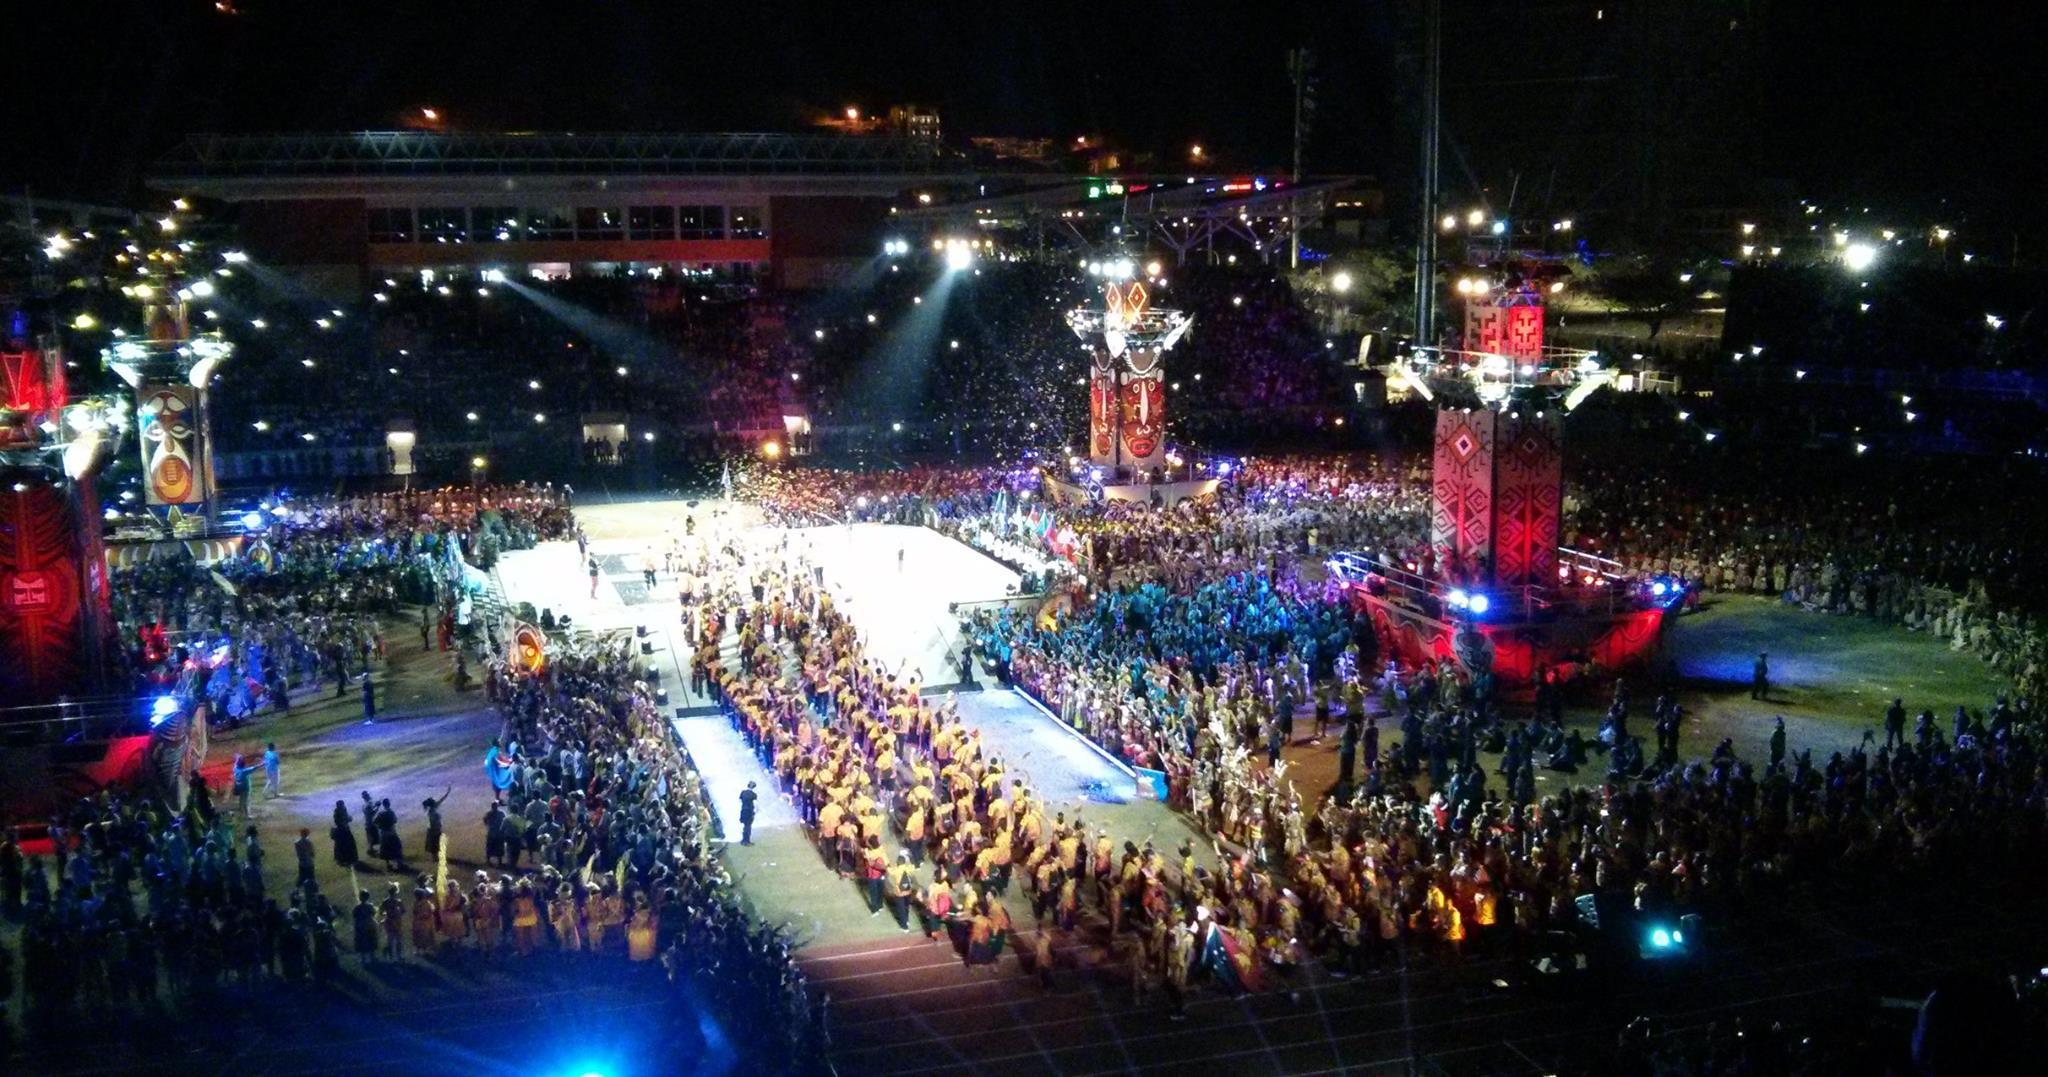 Pacific Games 2015 is underway